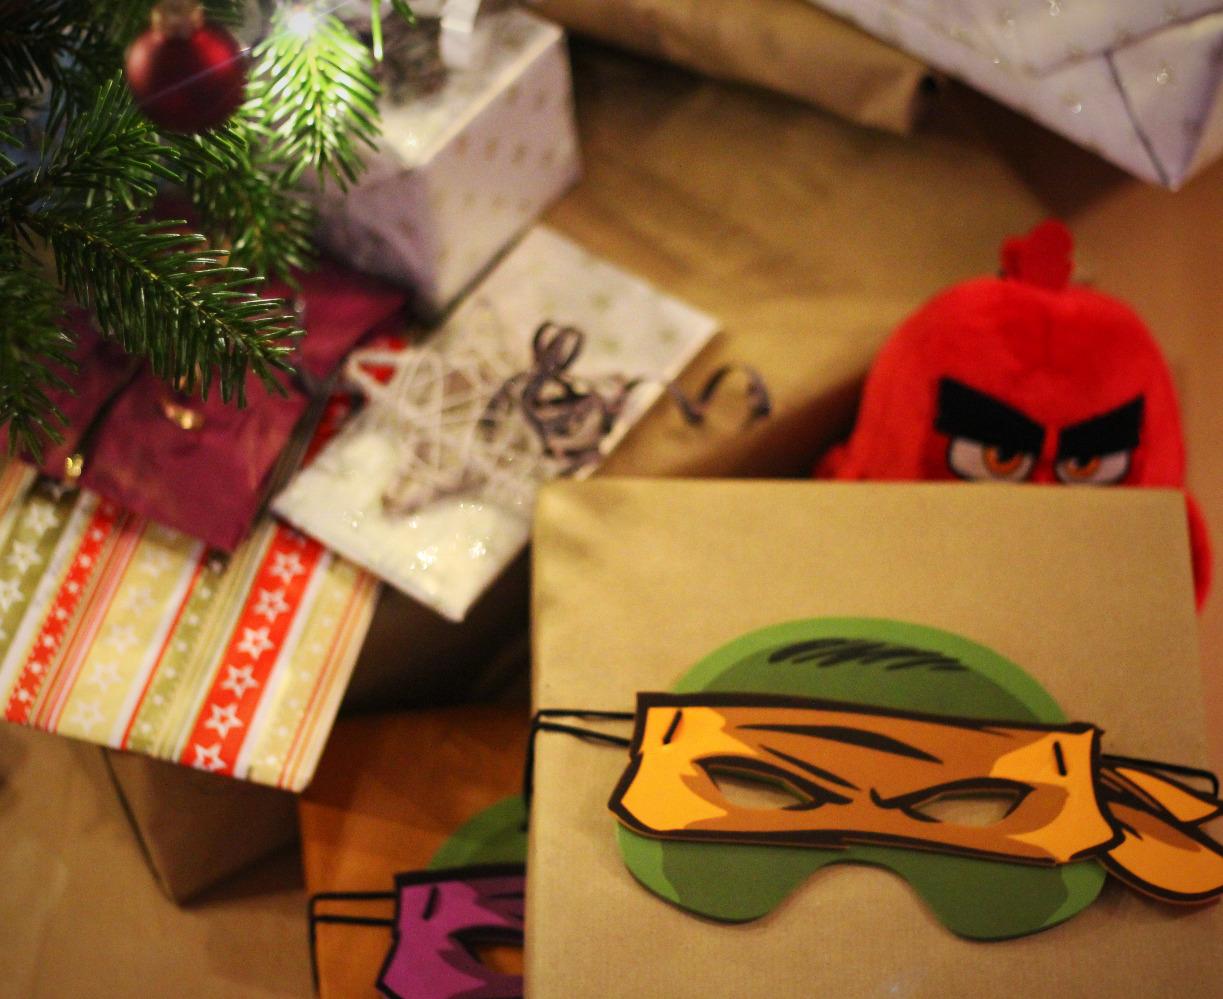 Geschenke schnell verpackt...